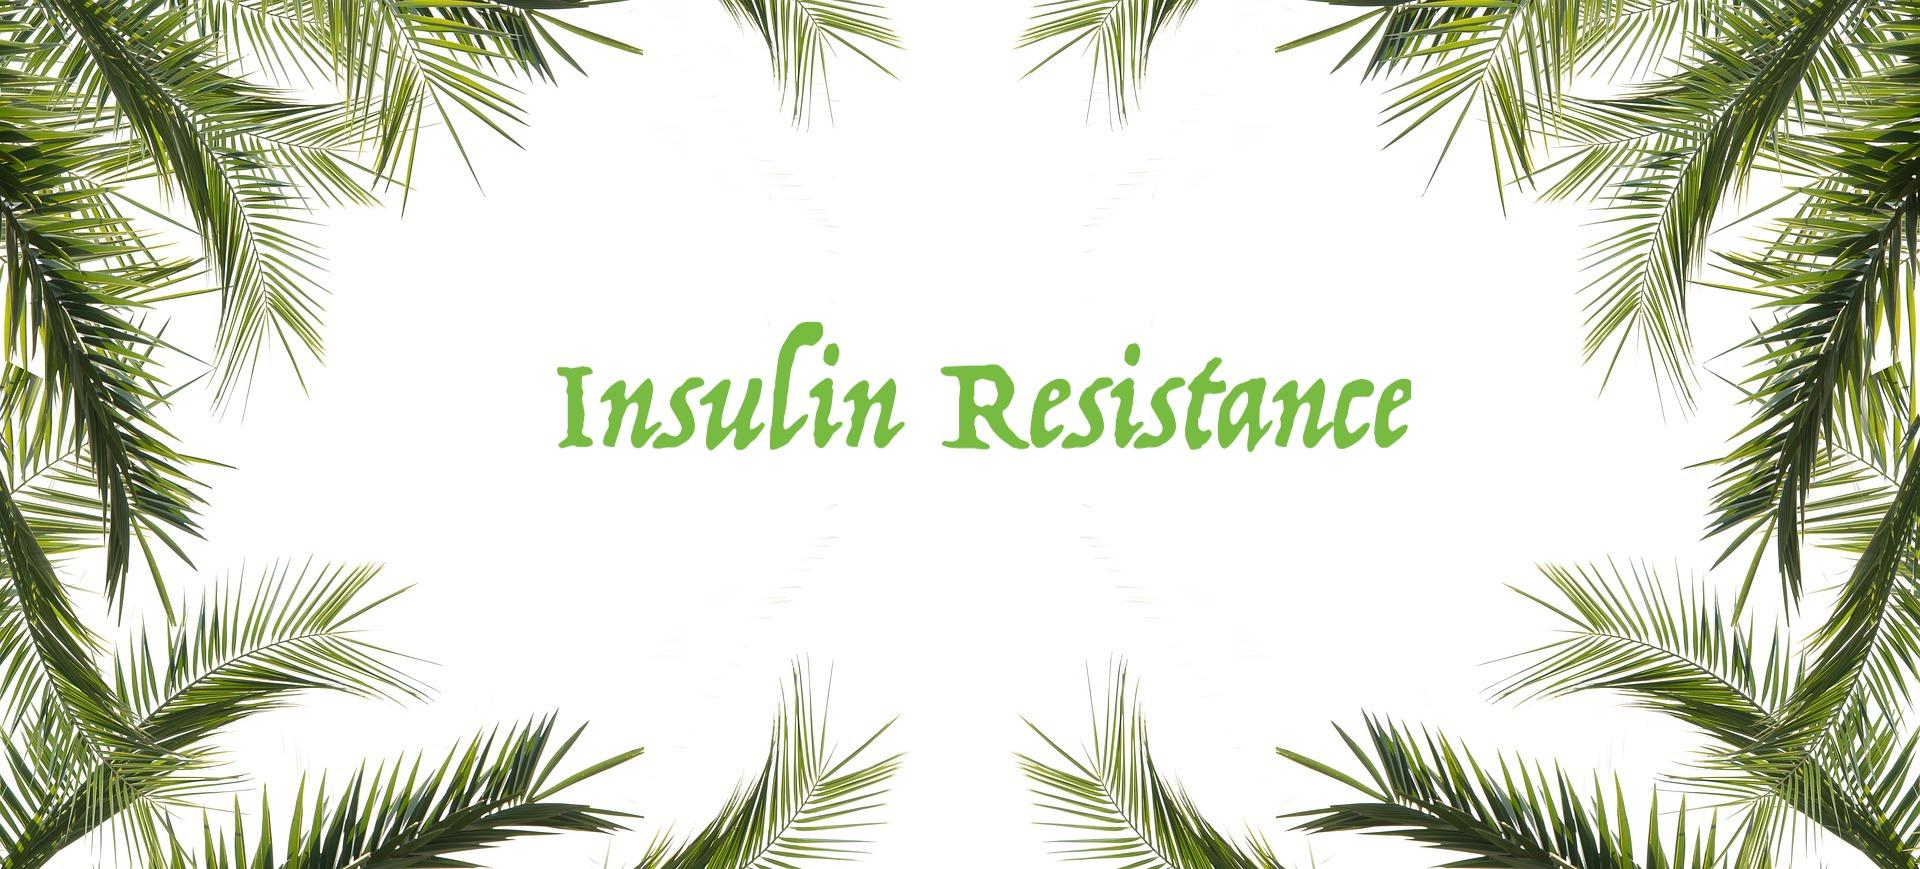 Insulin resistance.jpg